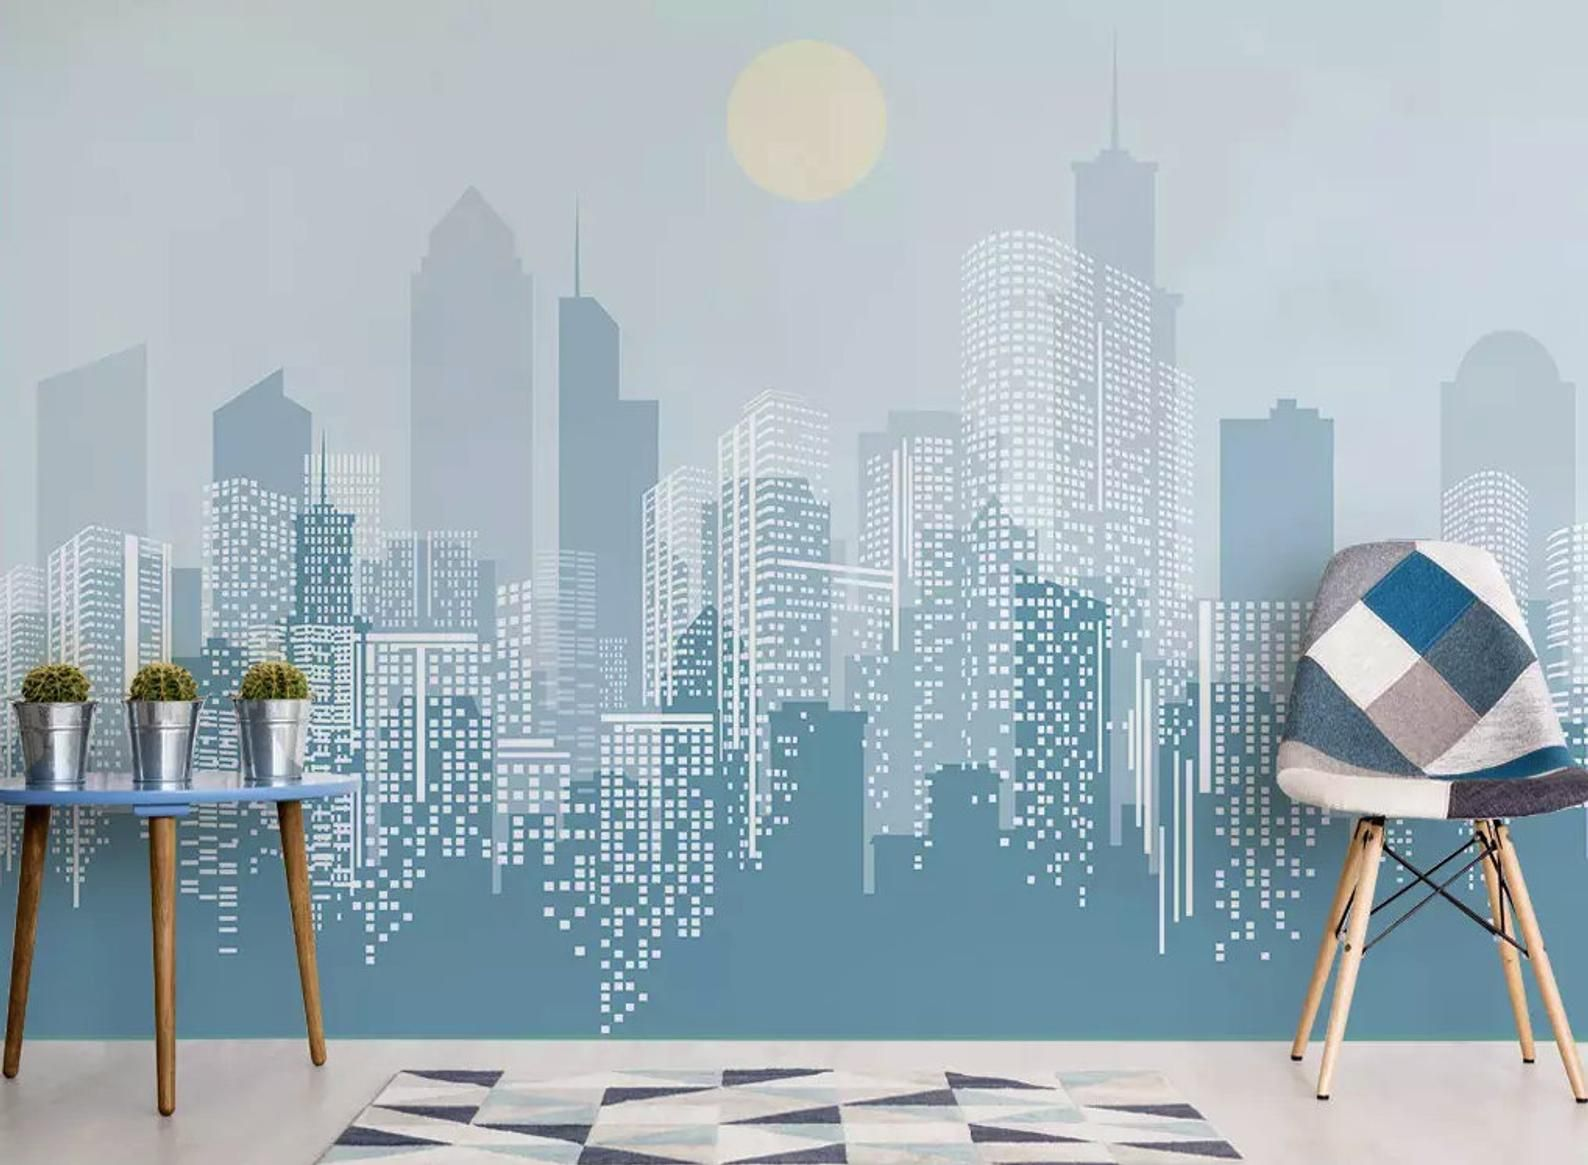 Monochrome City Wallpaper Cityscape Wall Mural Landscape Wall